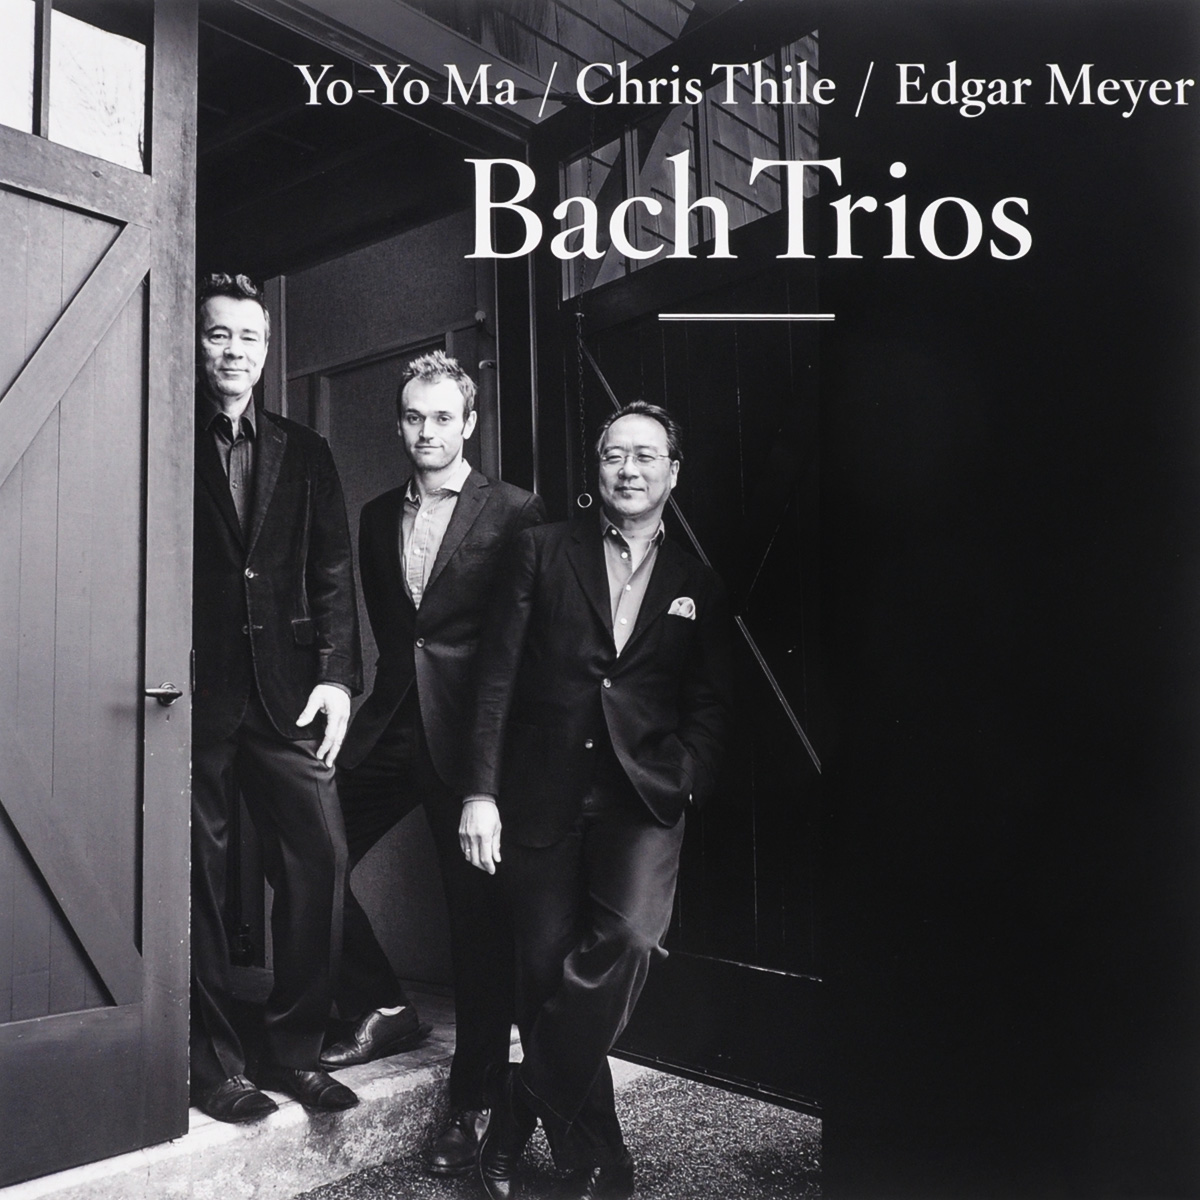 Йо-Йо Ма,Крис Тайл,Эдгар Мэйер Yo-Yo Ma, Chris Thile, Edgar Meyer. Bach Trios (2 LP) цена